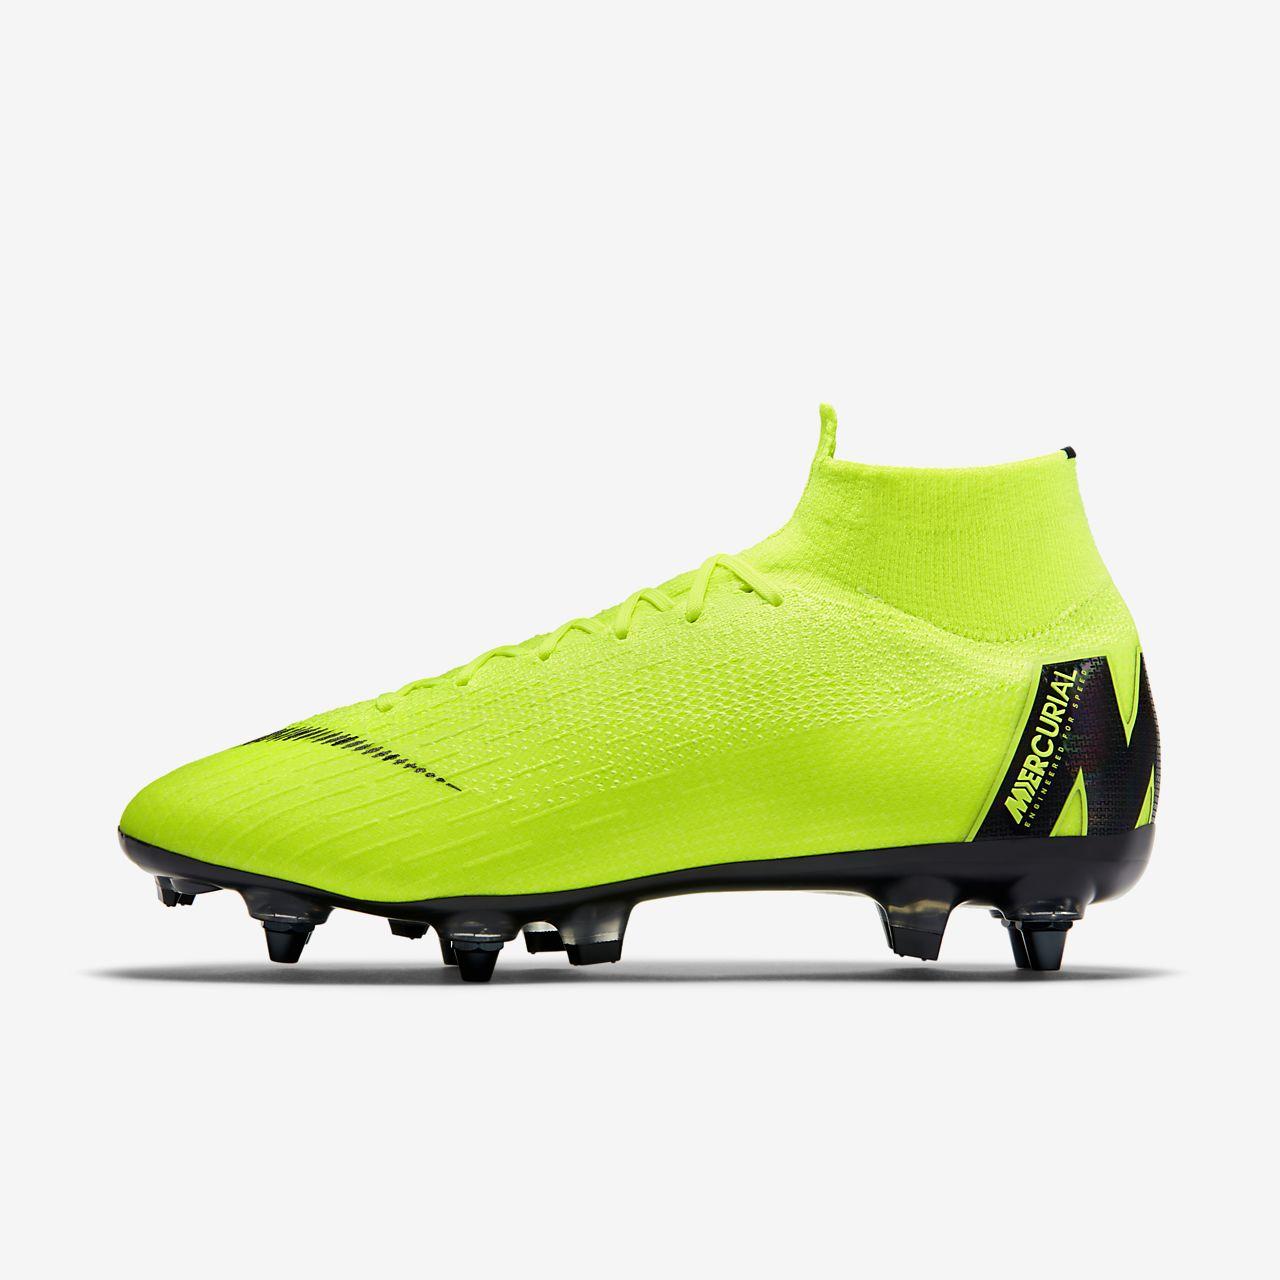 De Pour Mercurial Nike Crampons À Gras Terrain Chaussure Football n80PkwOX